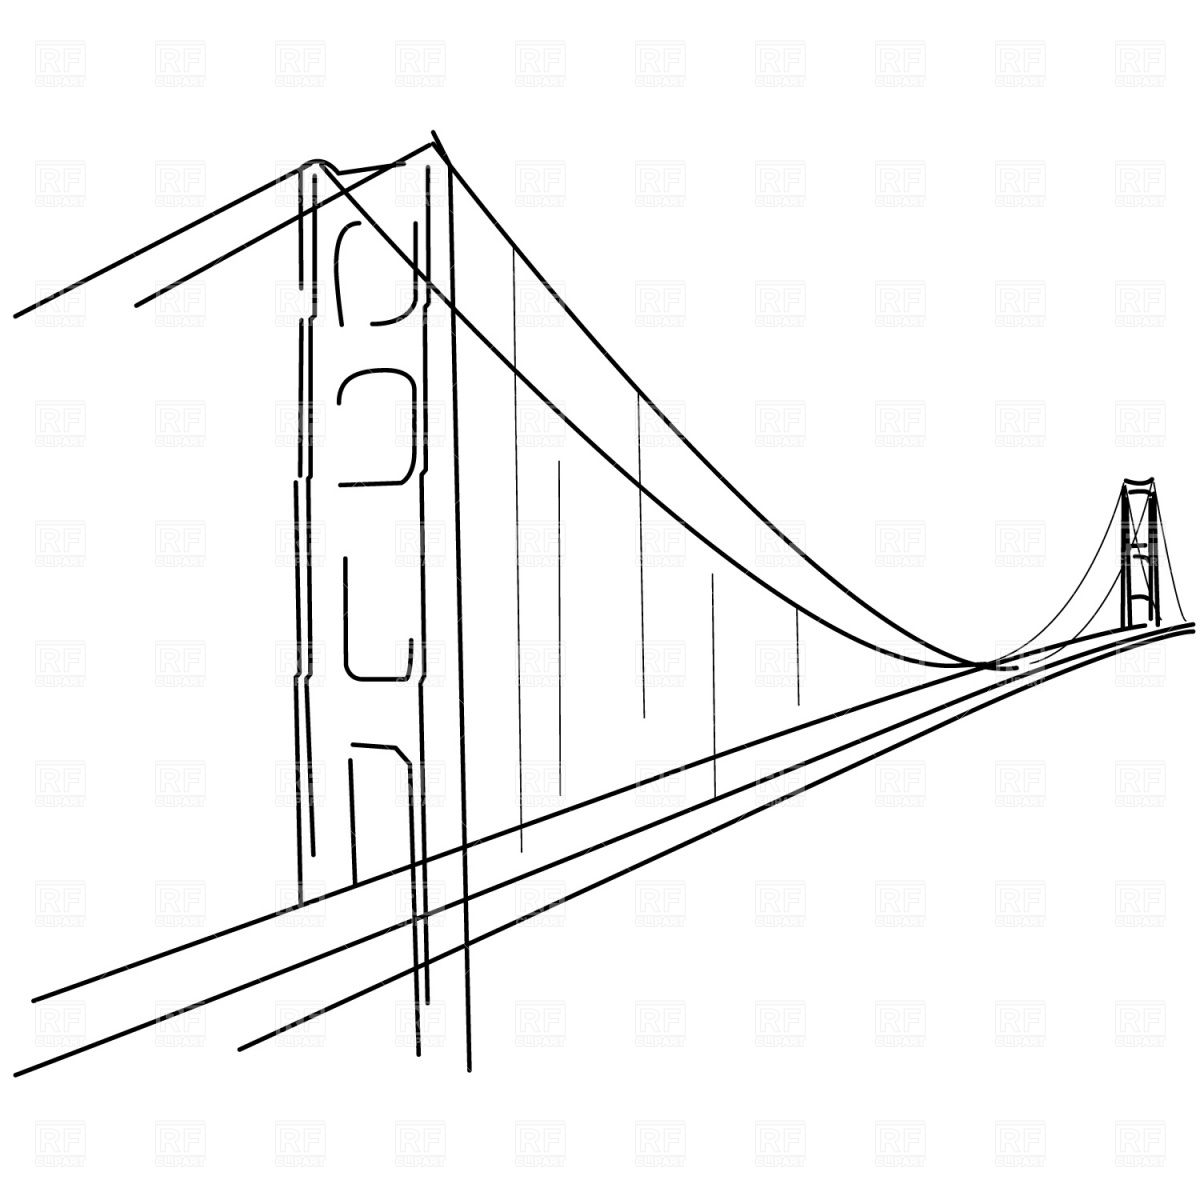 hight resolution of symbolic golden gate bridge silhouette stock vector image